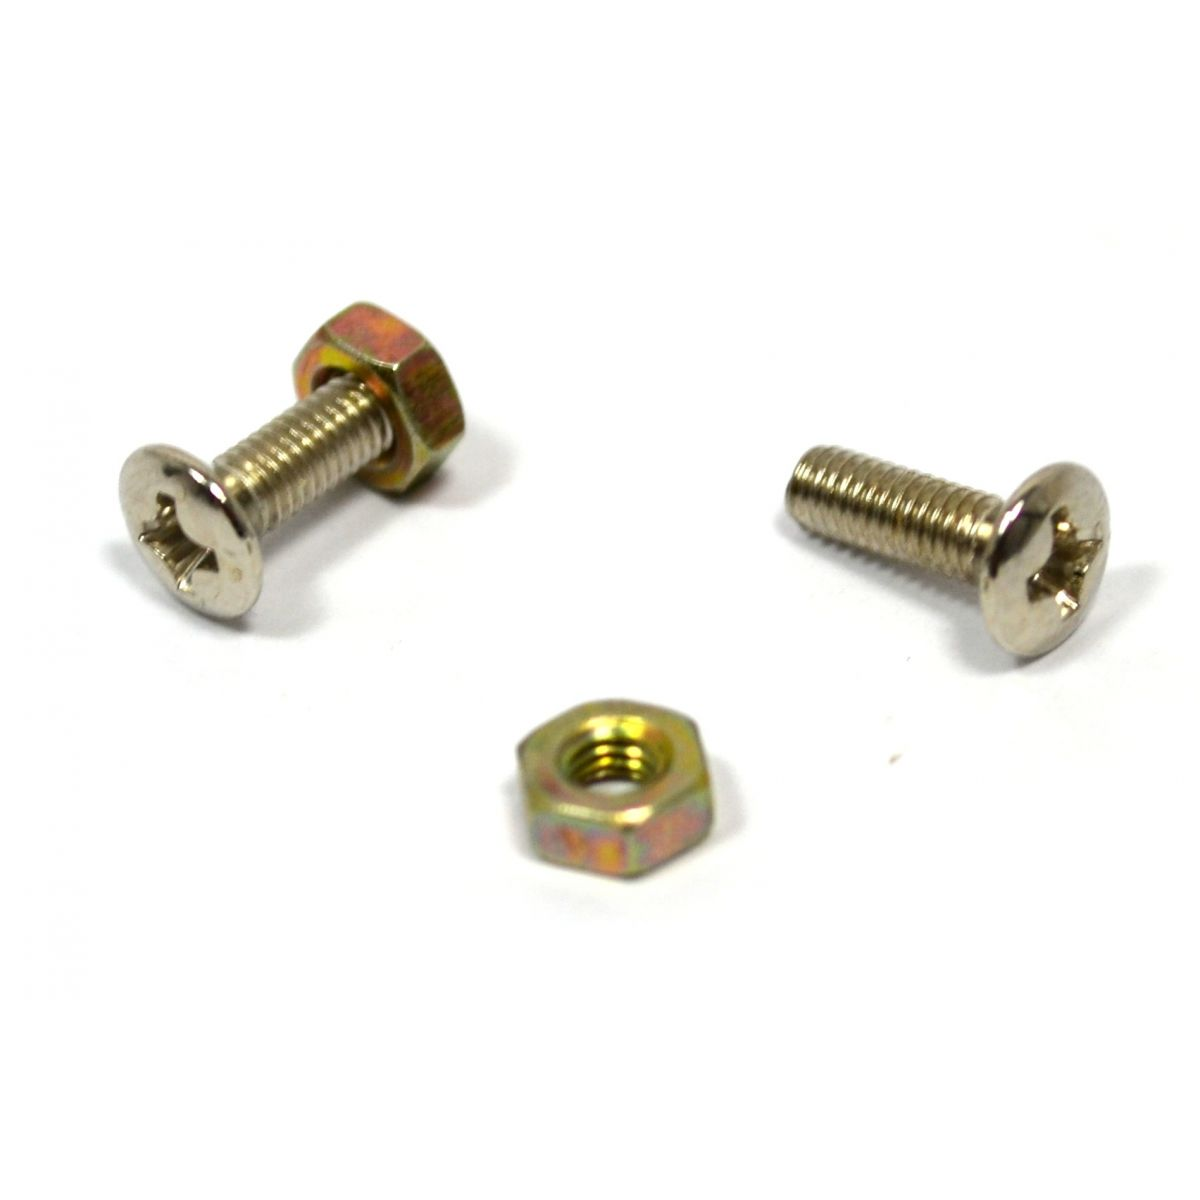 Parafuso cromado para escudo (Les Paul) (10mm x 3mm) - Kit c/ 2 peças  - Luthieria Brasil